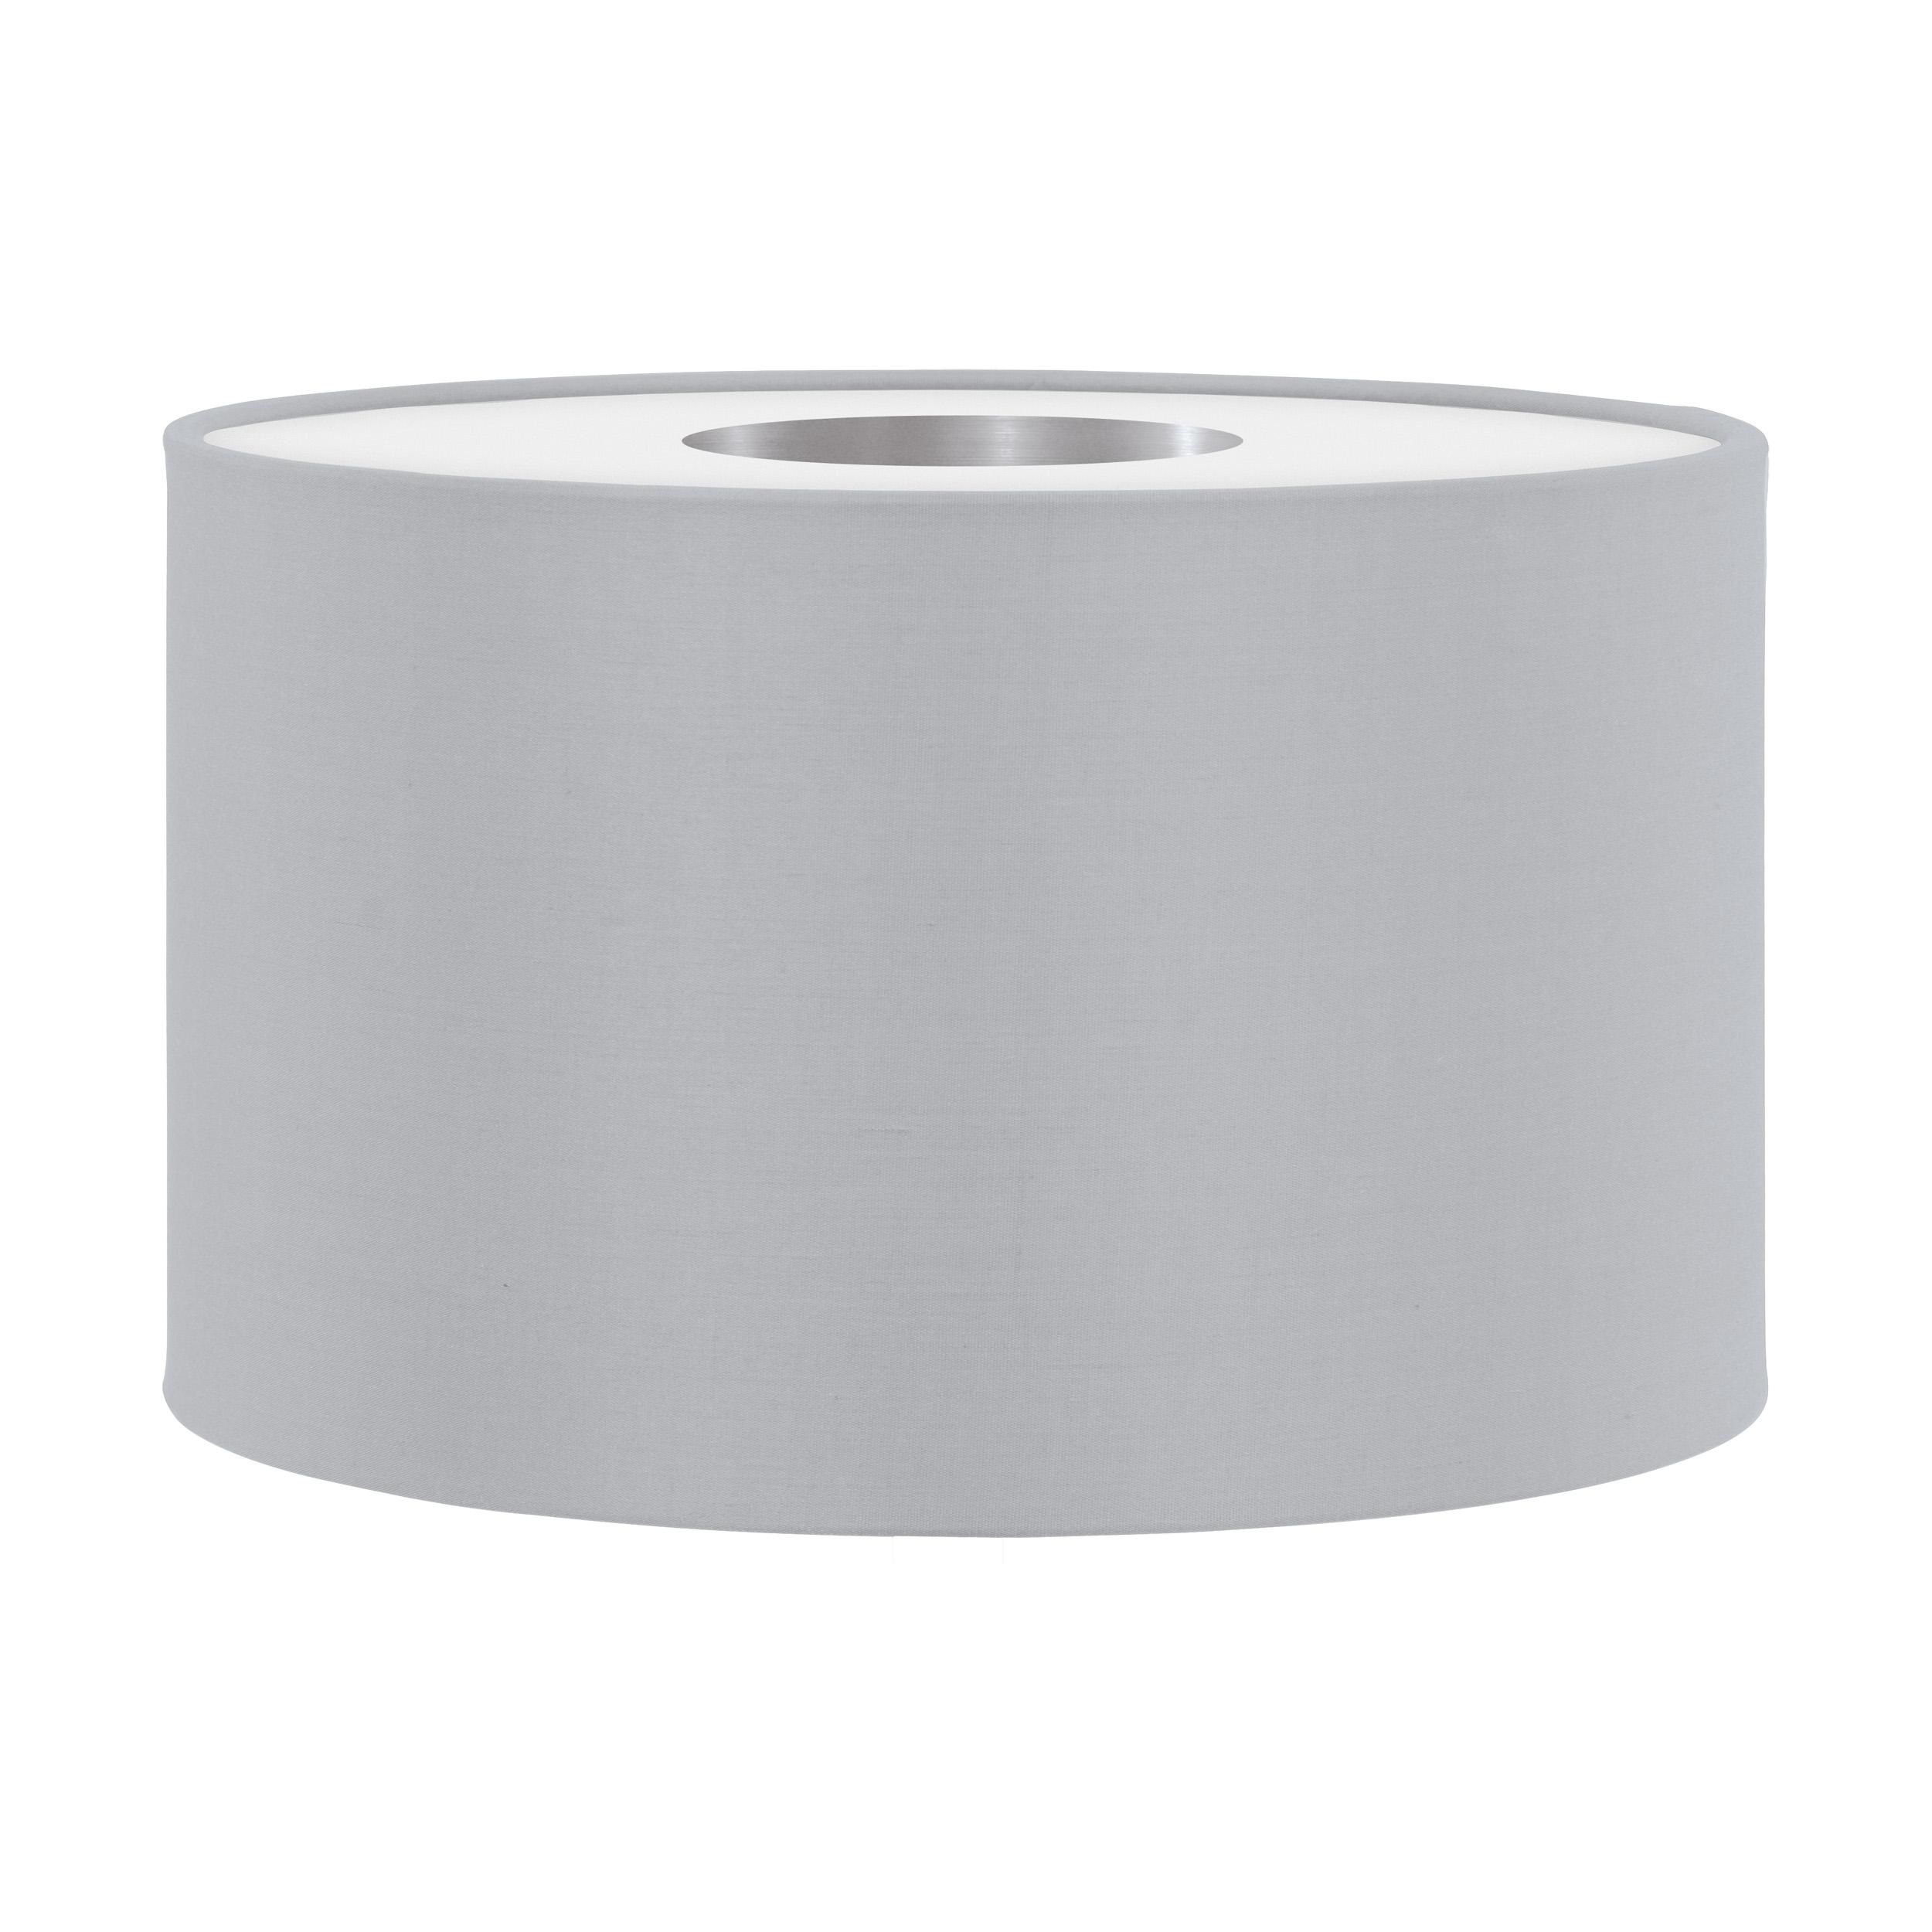 1 Stk Schirm Pasteri Pro inkl. Diffuser grau/silber  LI62664---